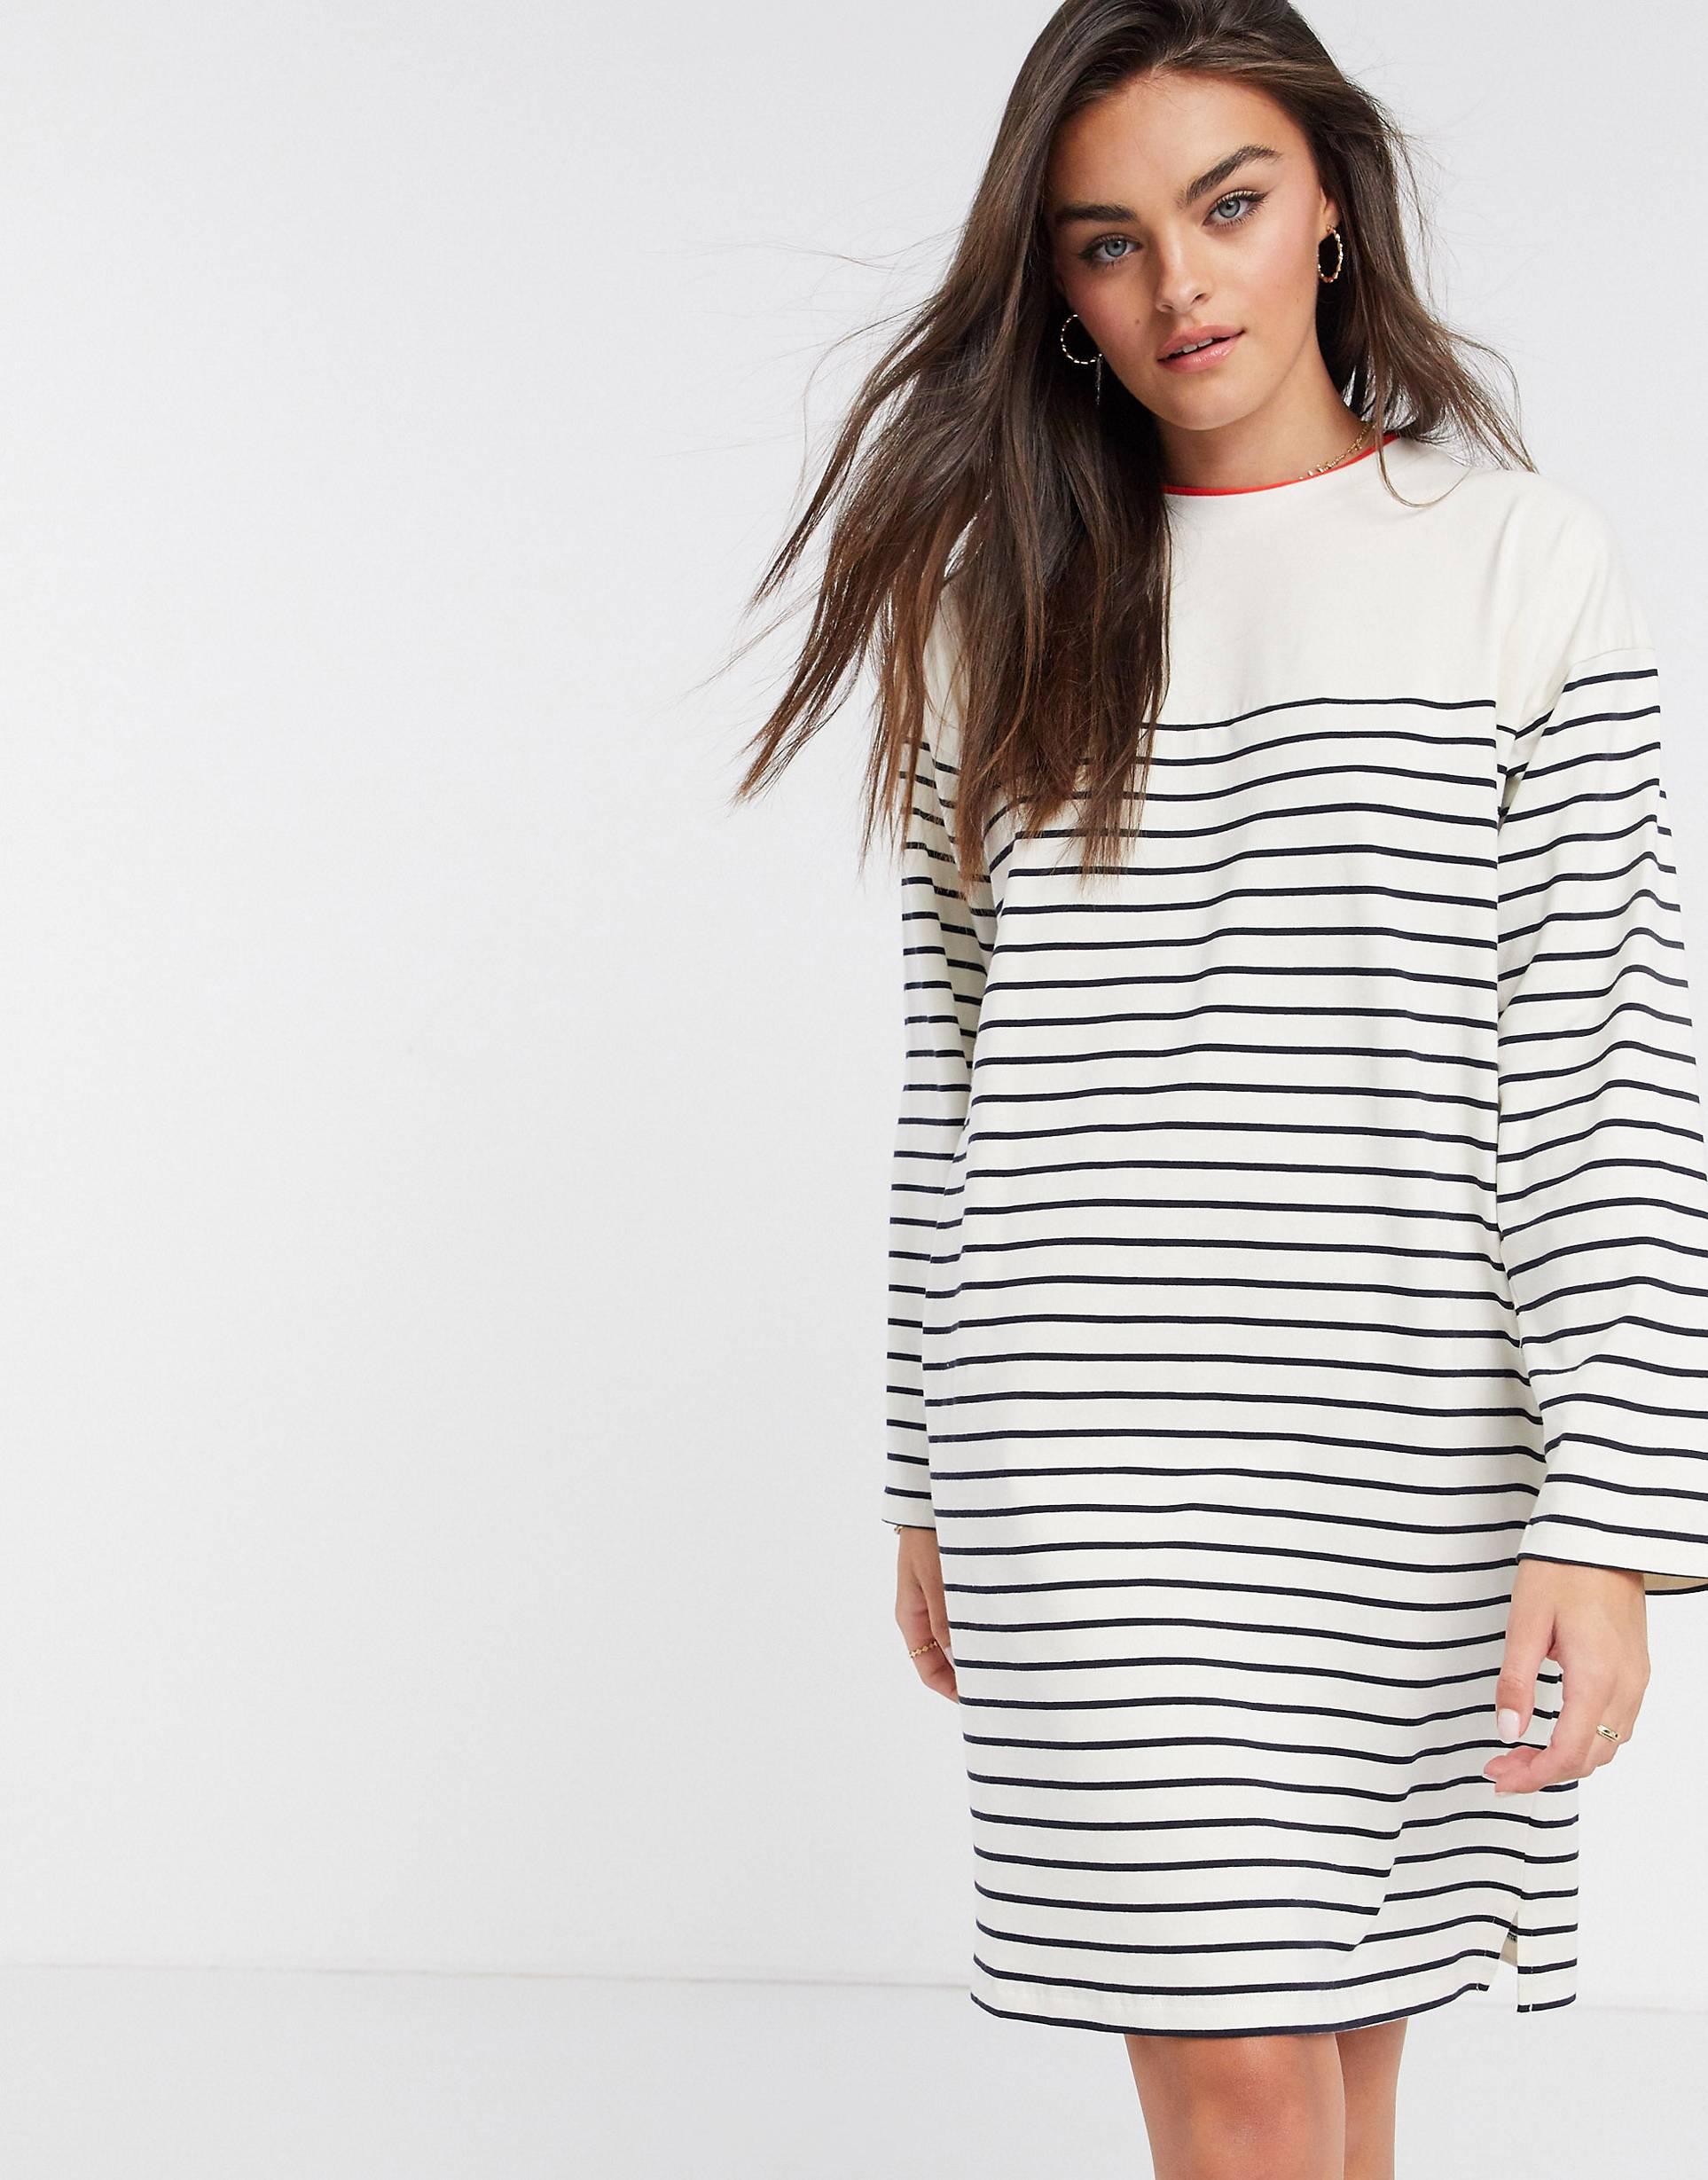 Vestido de manga larga a rayas bretonas.